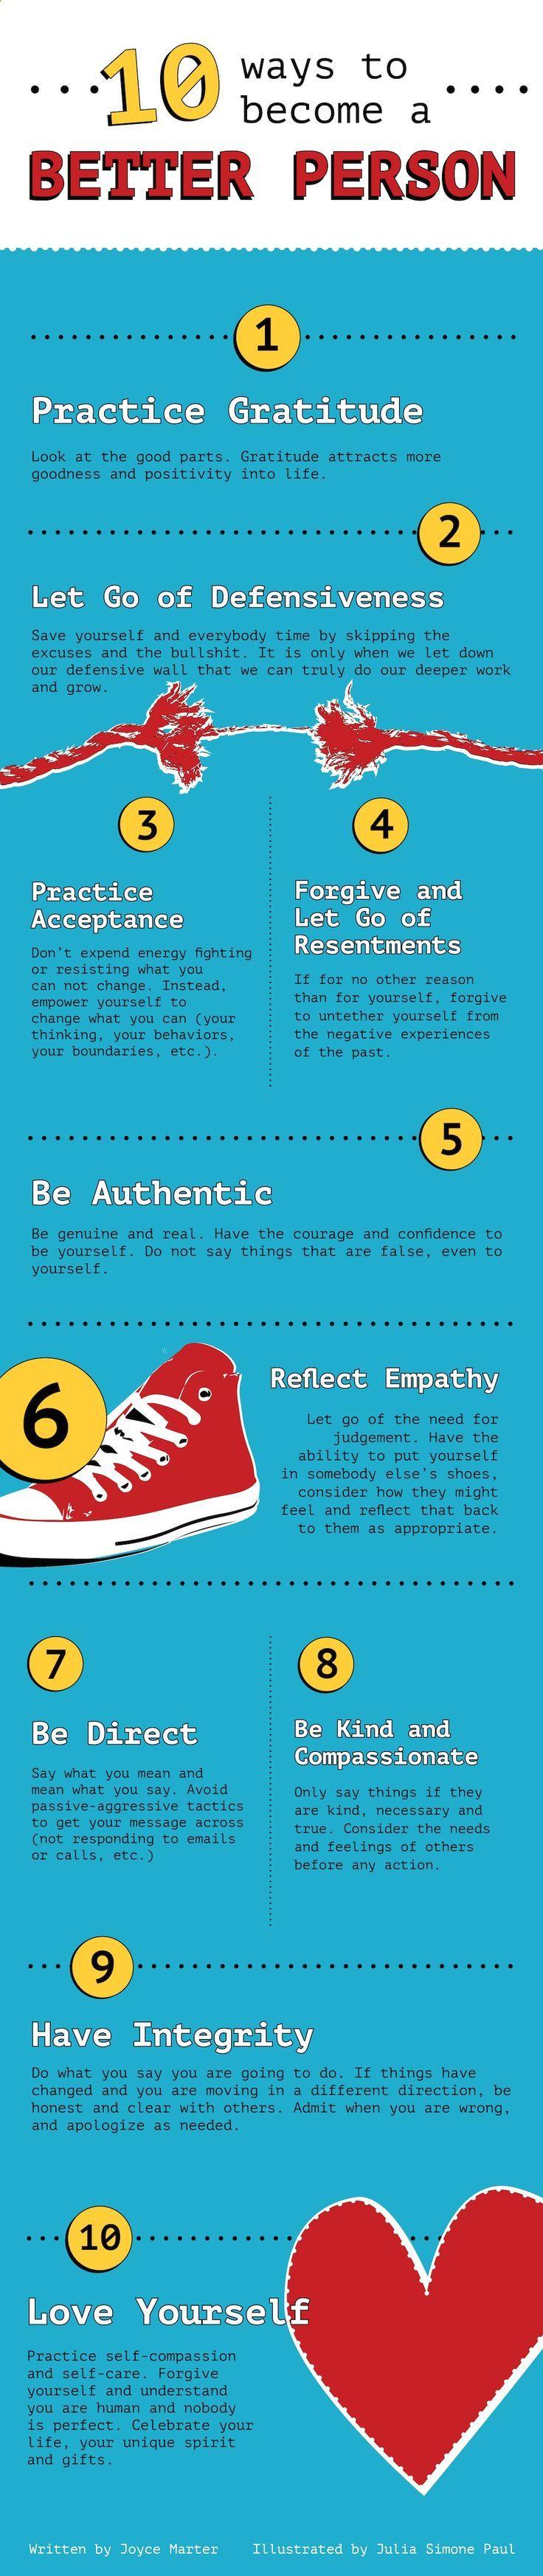 Ways of enjoying life more - infographic